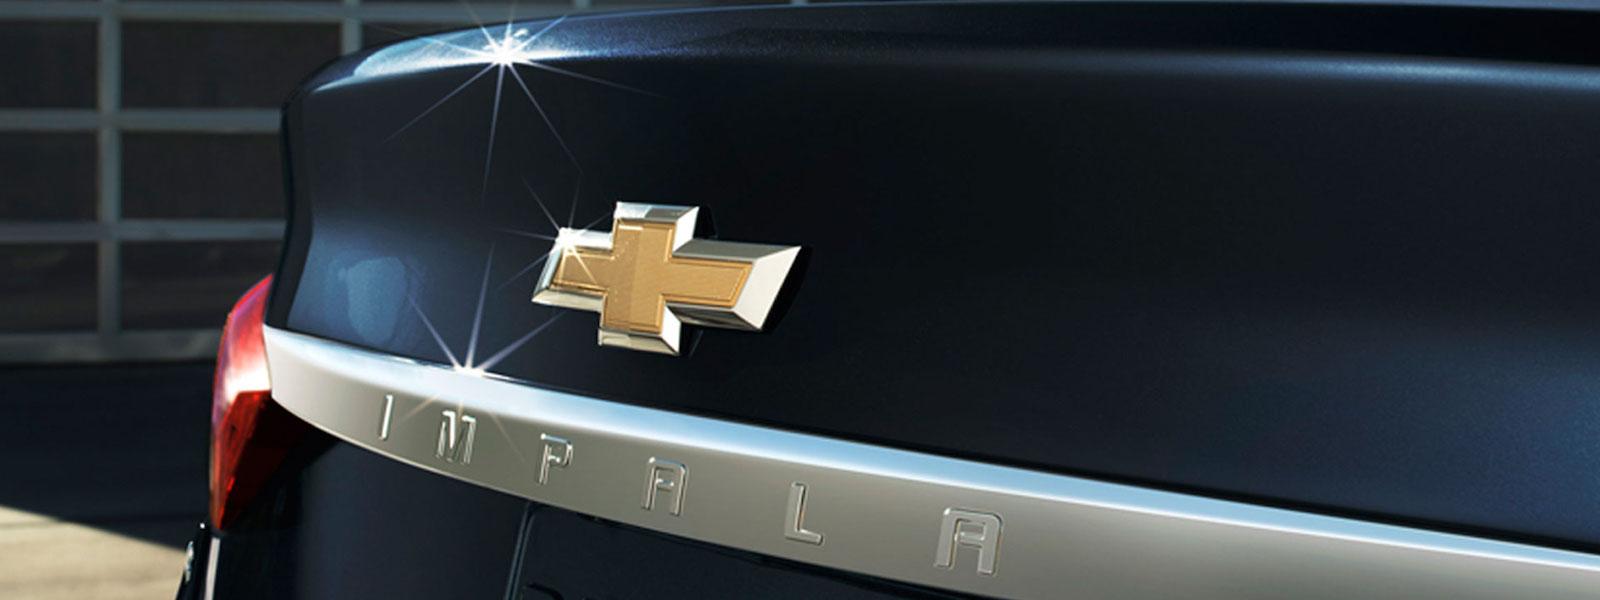 2016 Chevy Impala in black